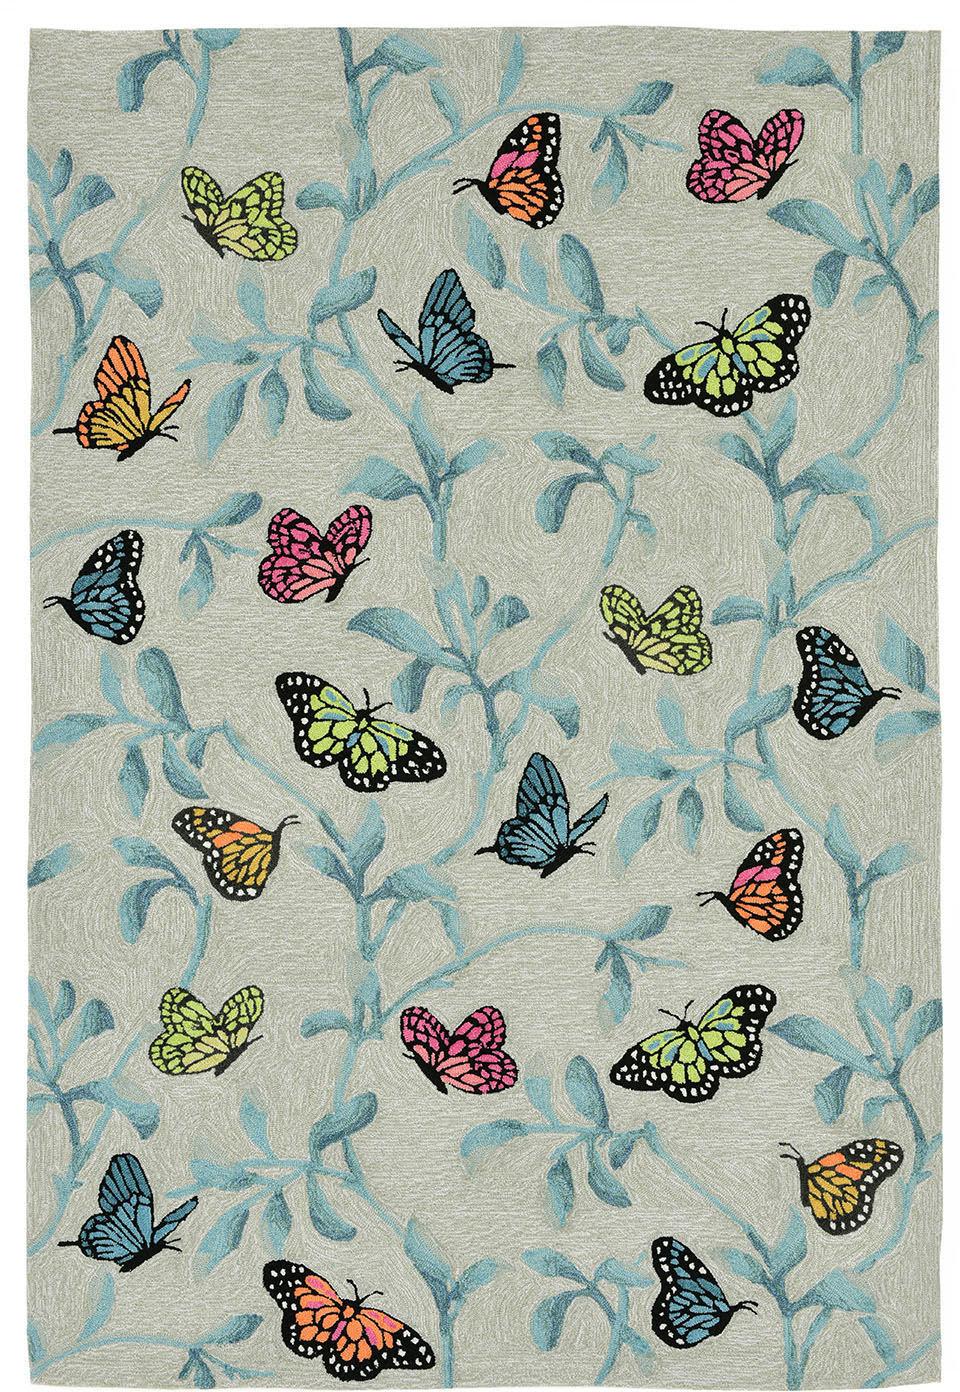 Trans Ocean Ravella Butterflies On Tree 227406 Green Rug Studio